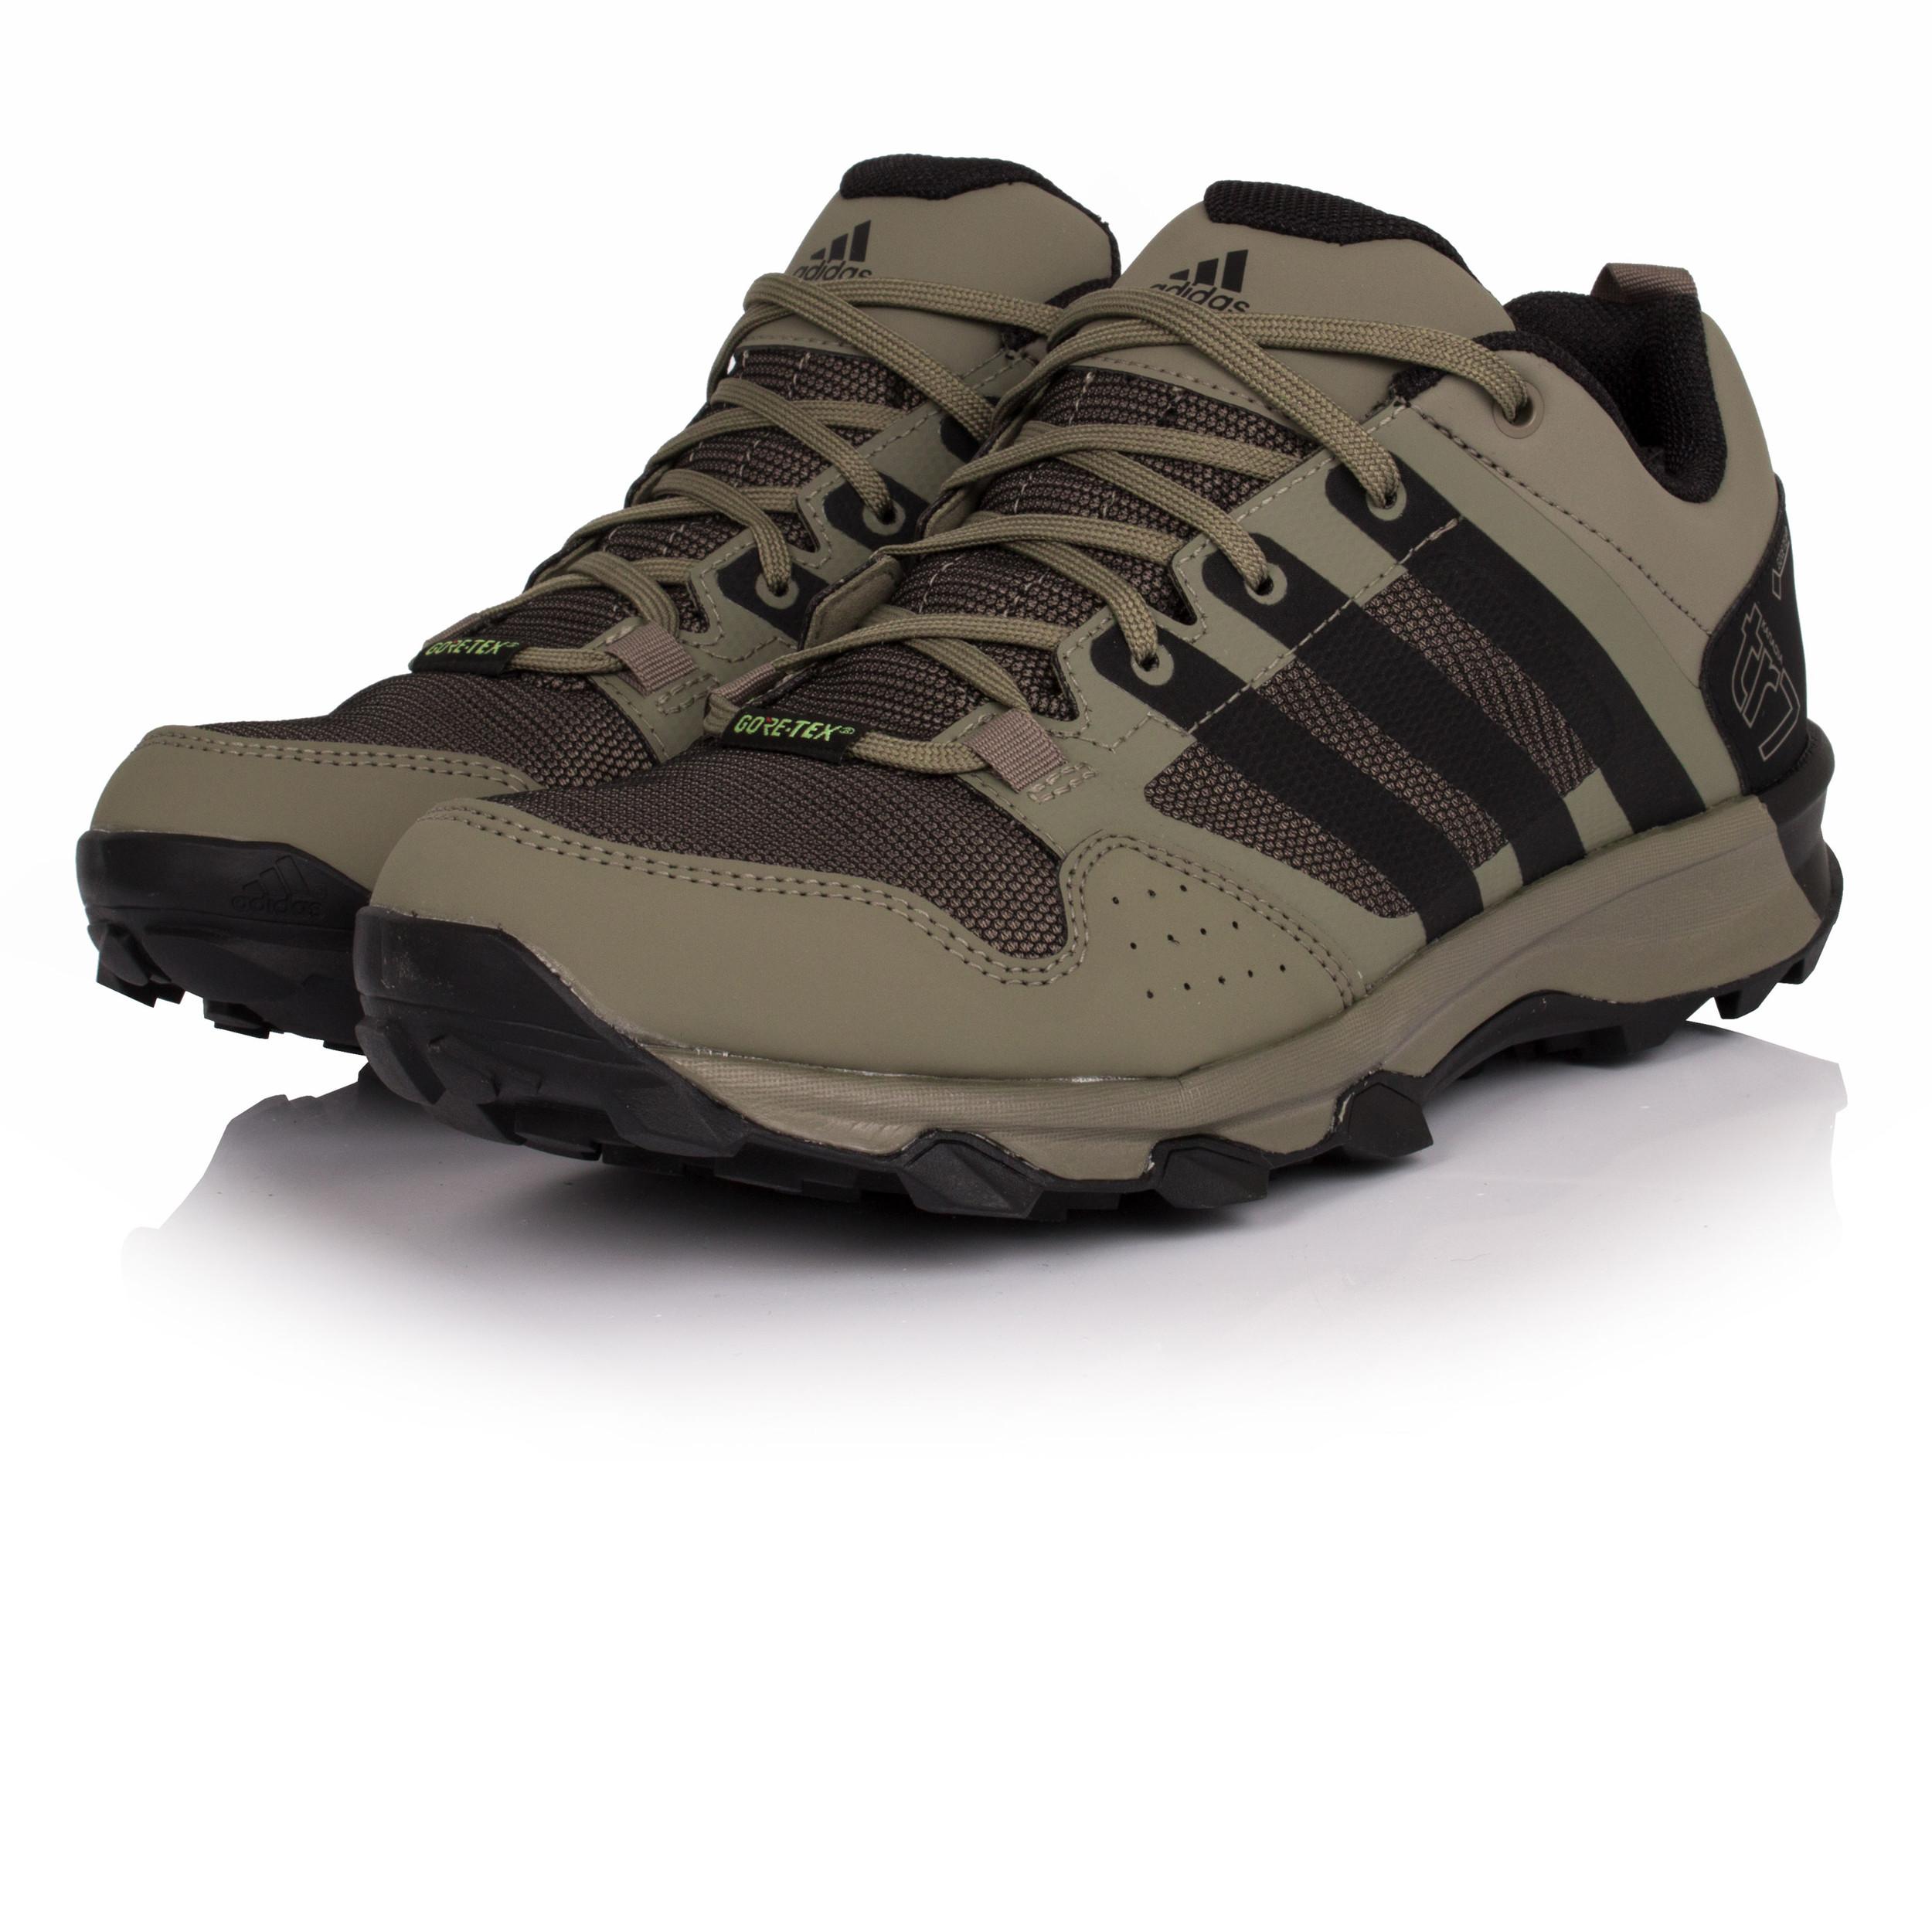 hot sale online 44e9a 42fa0 Adidas Kanadia 7 TR Mens Green Gore Tex Running Sports Shoes Trainers Pumps    eBay